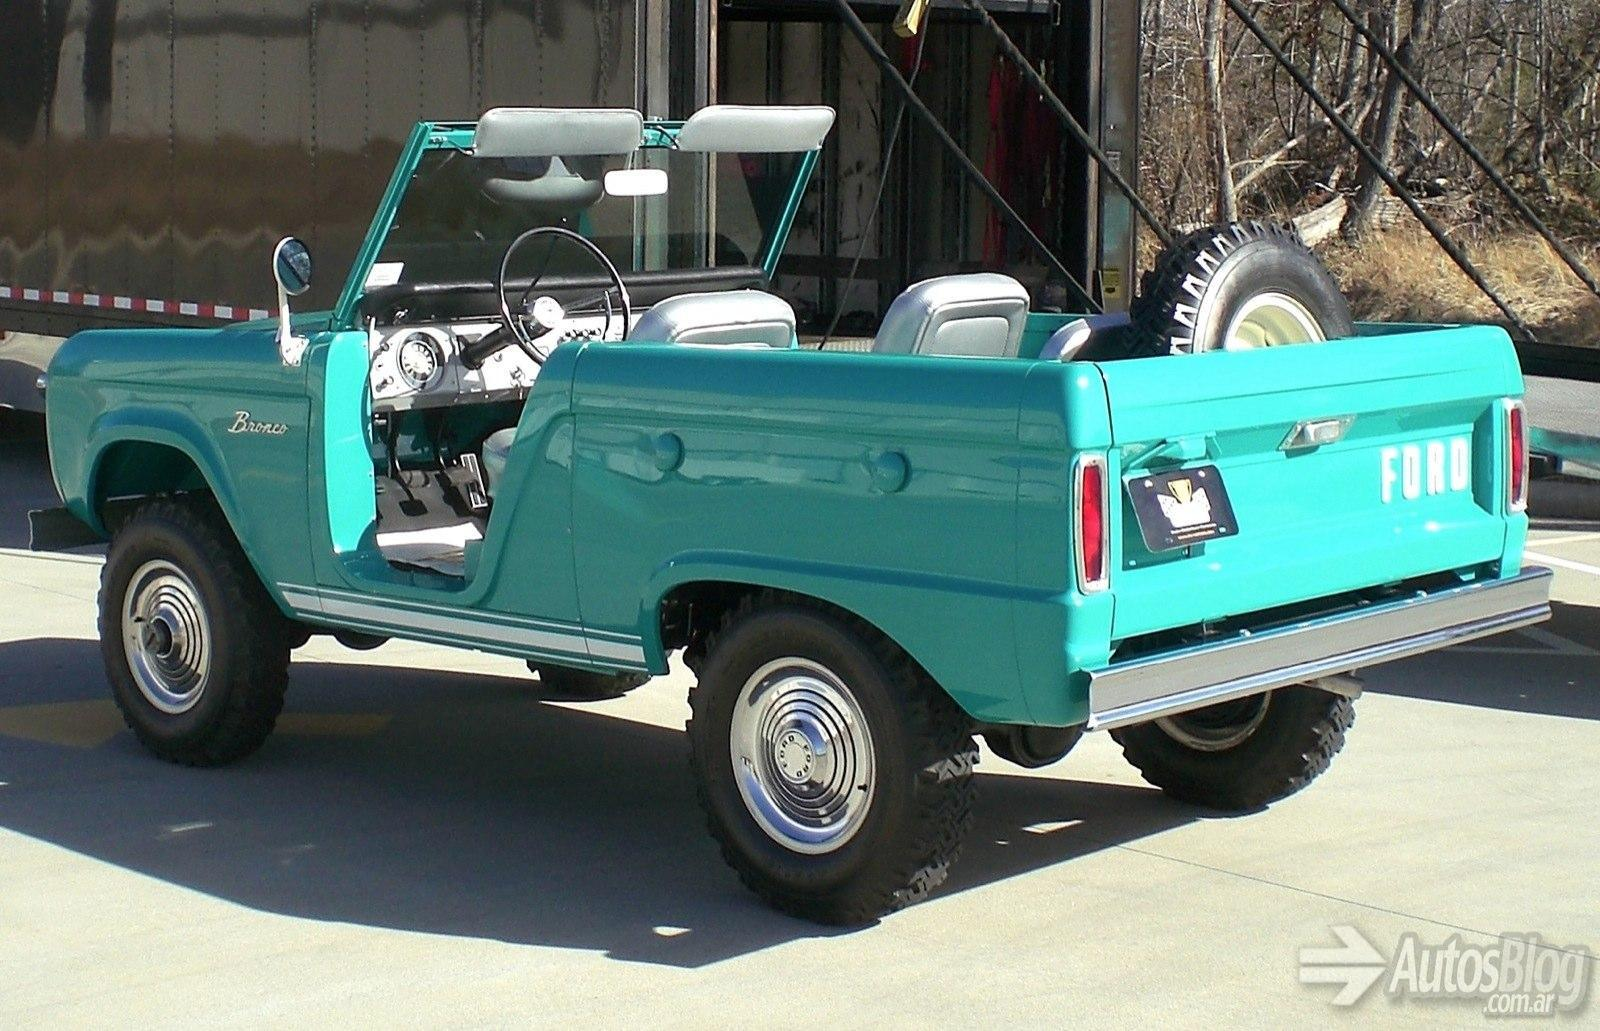 ford-bronco-roadster-1966-26.jpg